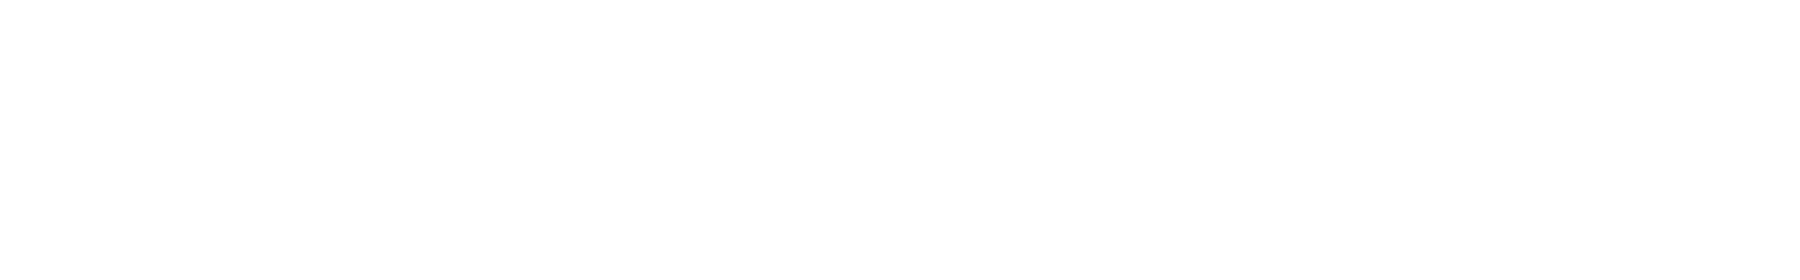 blbc jazzydrums 95 02